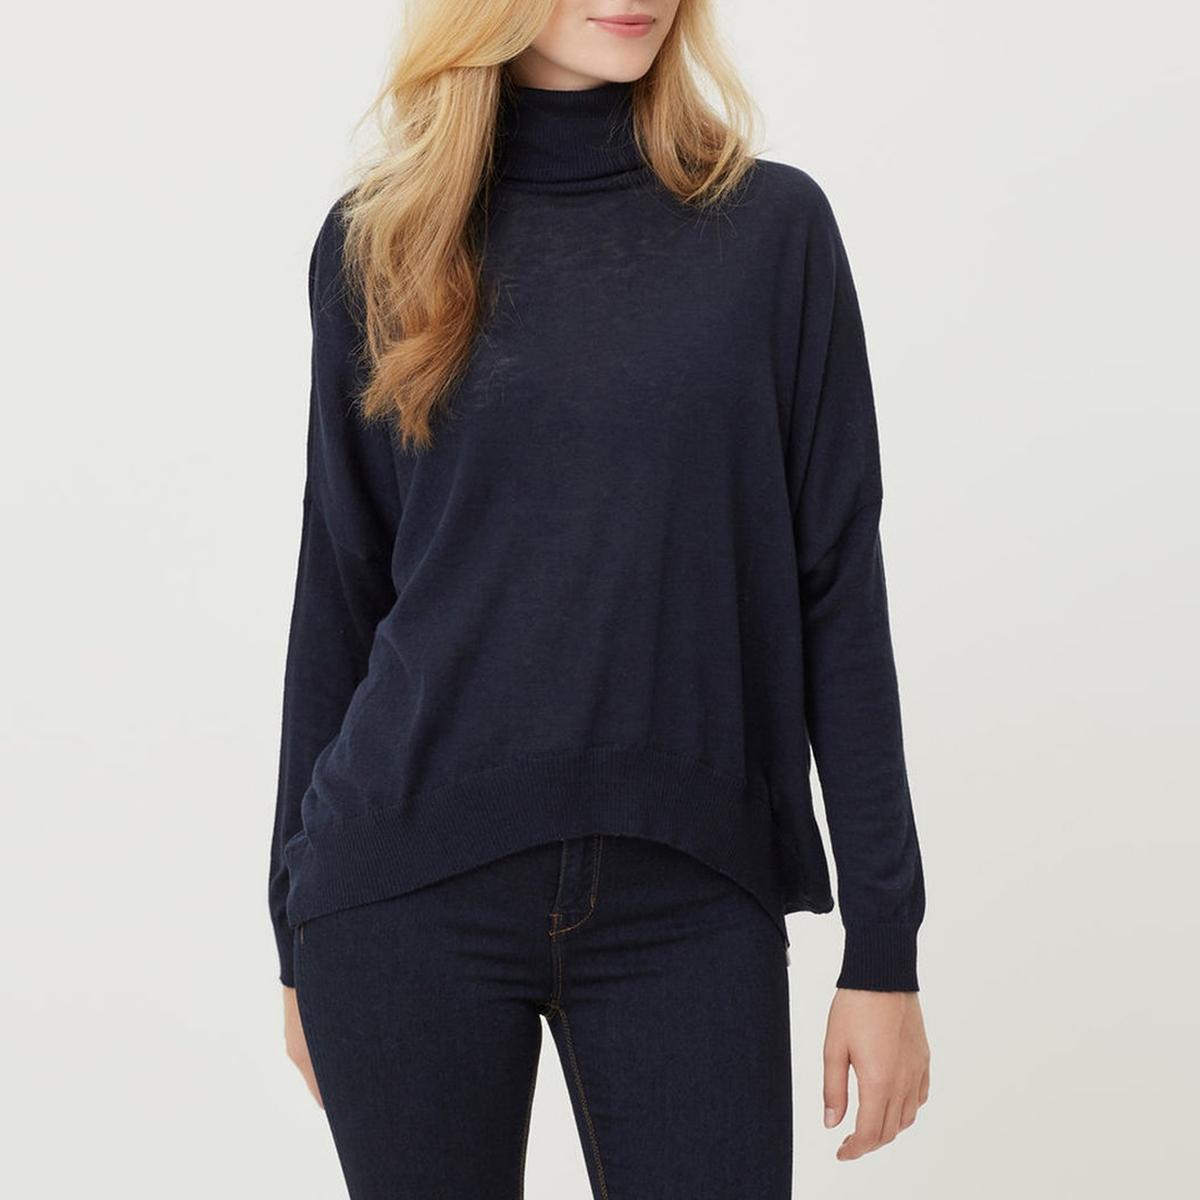 Пуловер VMIBNE LS OVERSIZE BLOUSEСостав и описание :Материал : 80% полиамида, 20% эластанаМарка : VERO MODA<br><br>Цвет: темно-синий<br>Размер: XS